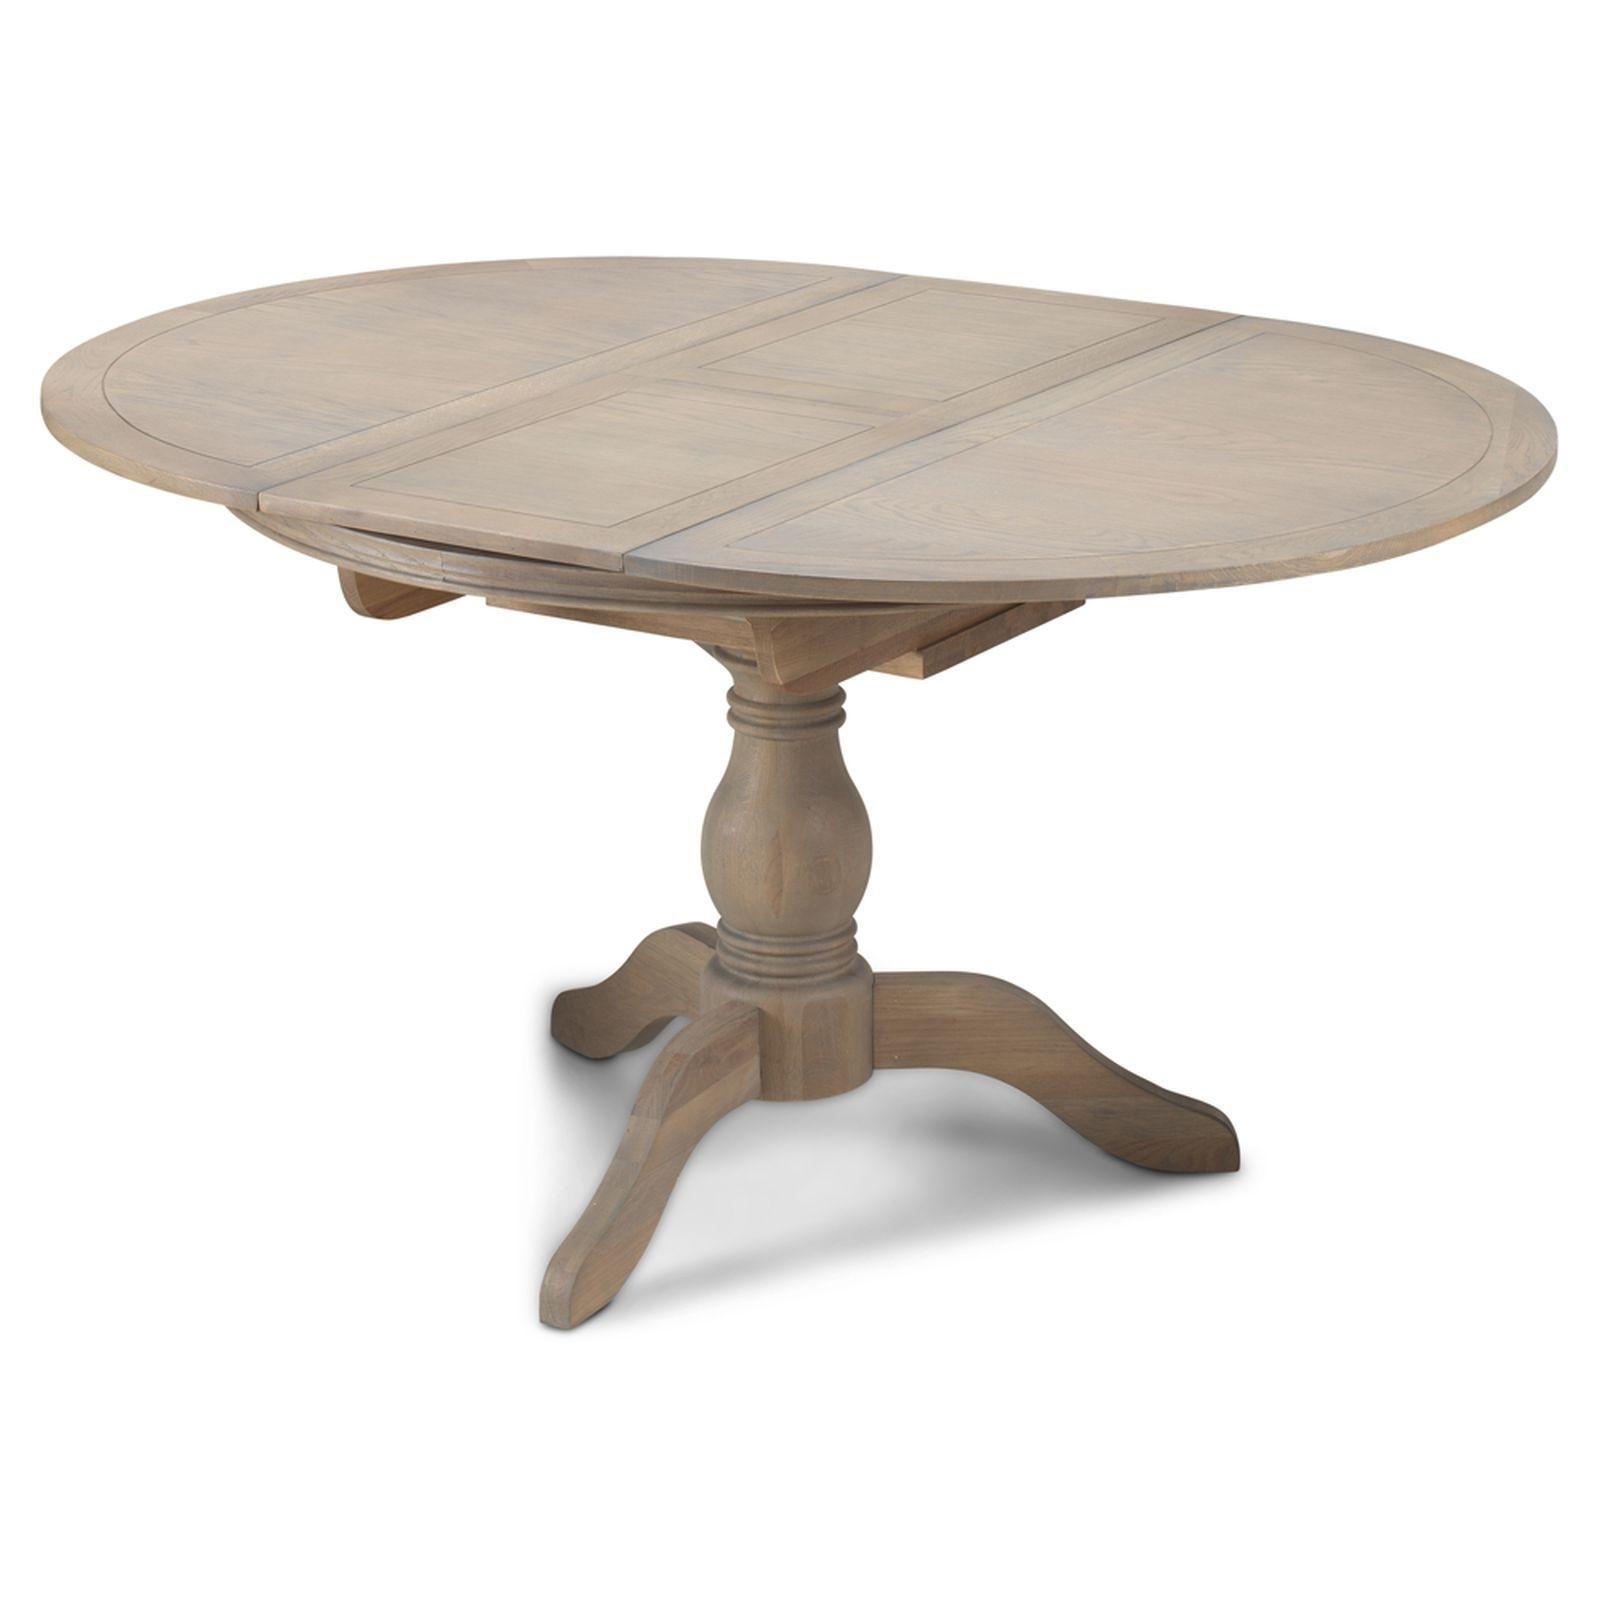 Circular Oak Dining Tables Regarding Most Popular Paloma Oak Furniture Grey Extending Round Circular Dining Table (View 13 of 25)